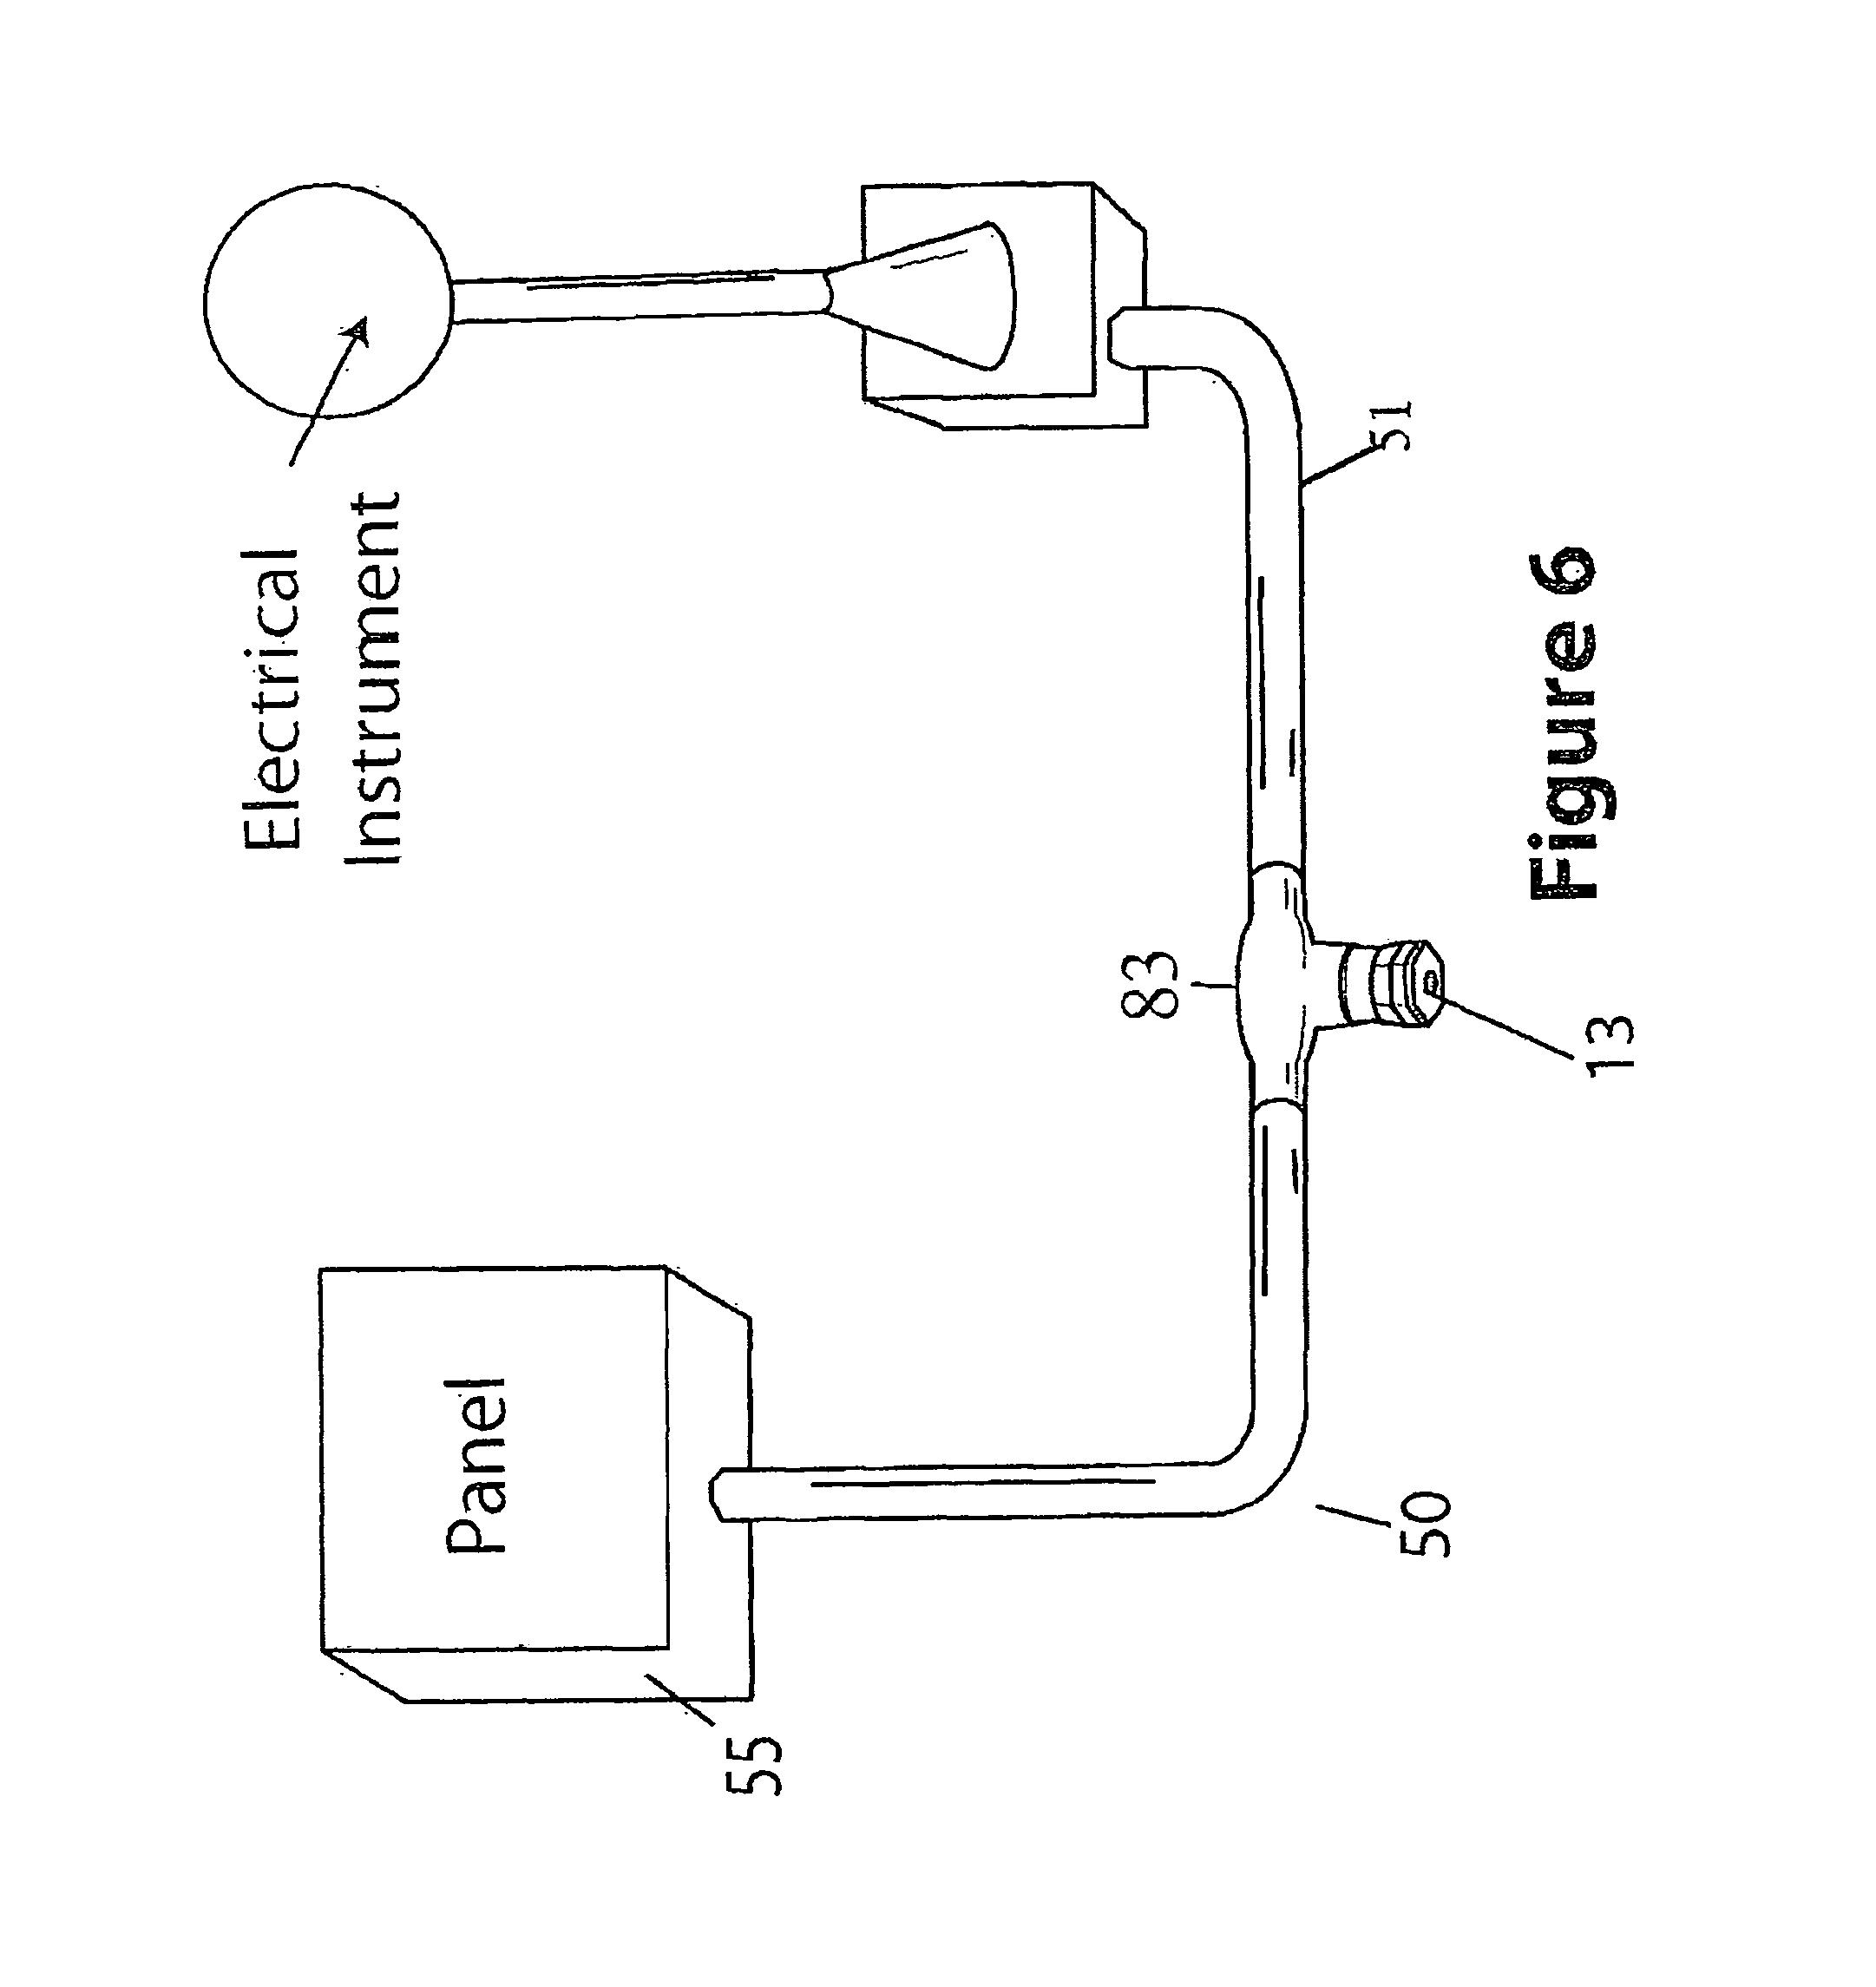 patent us20140110008 - drain nipple